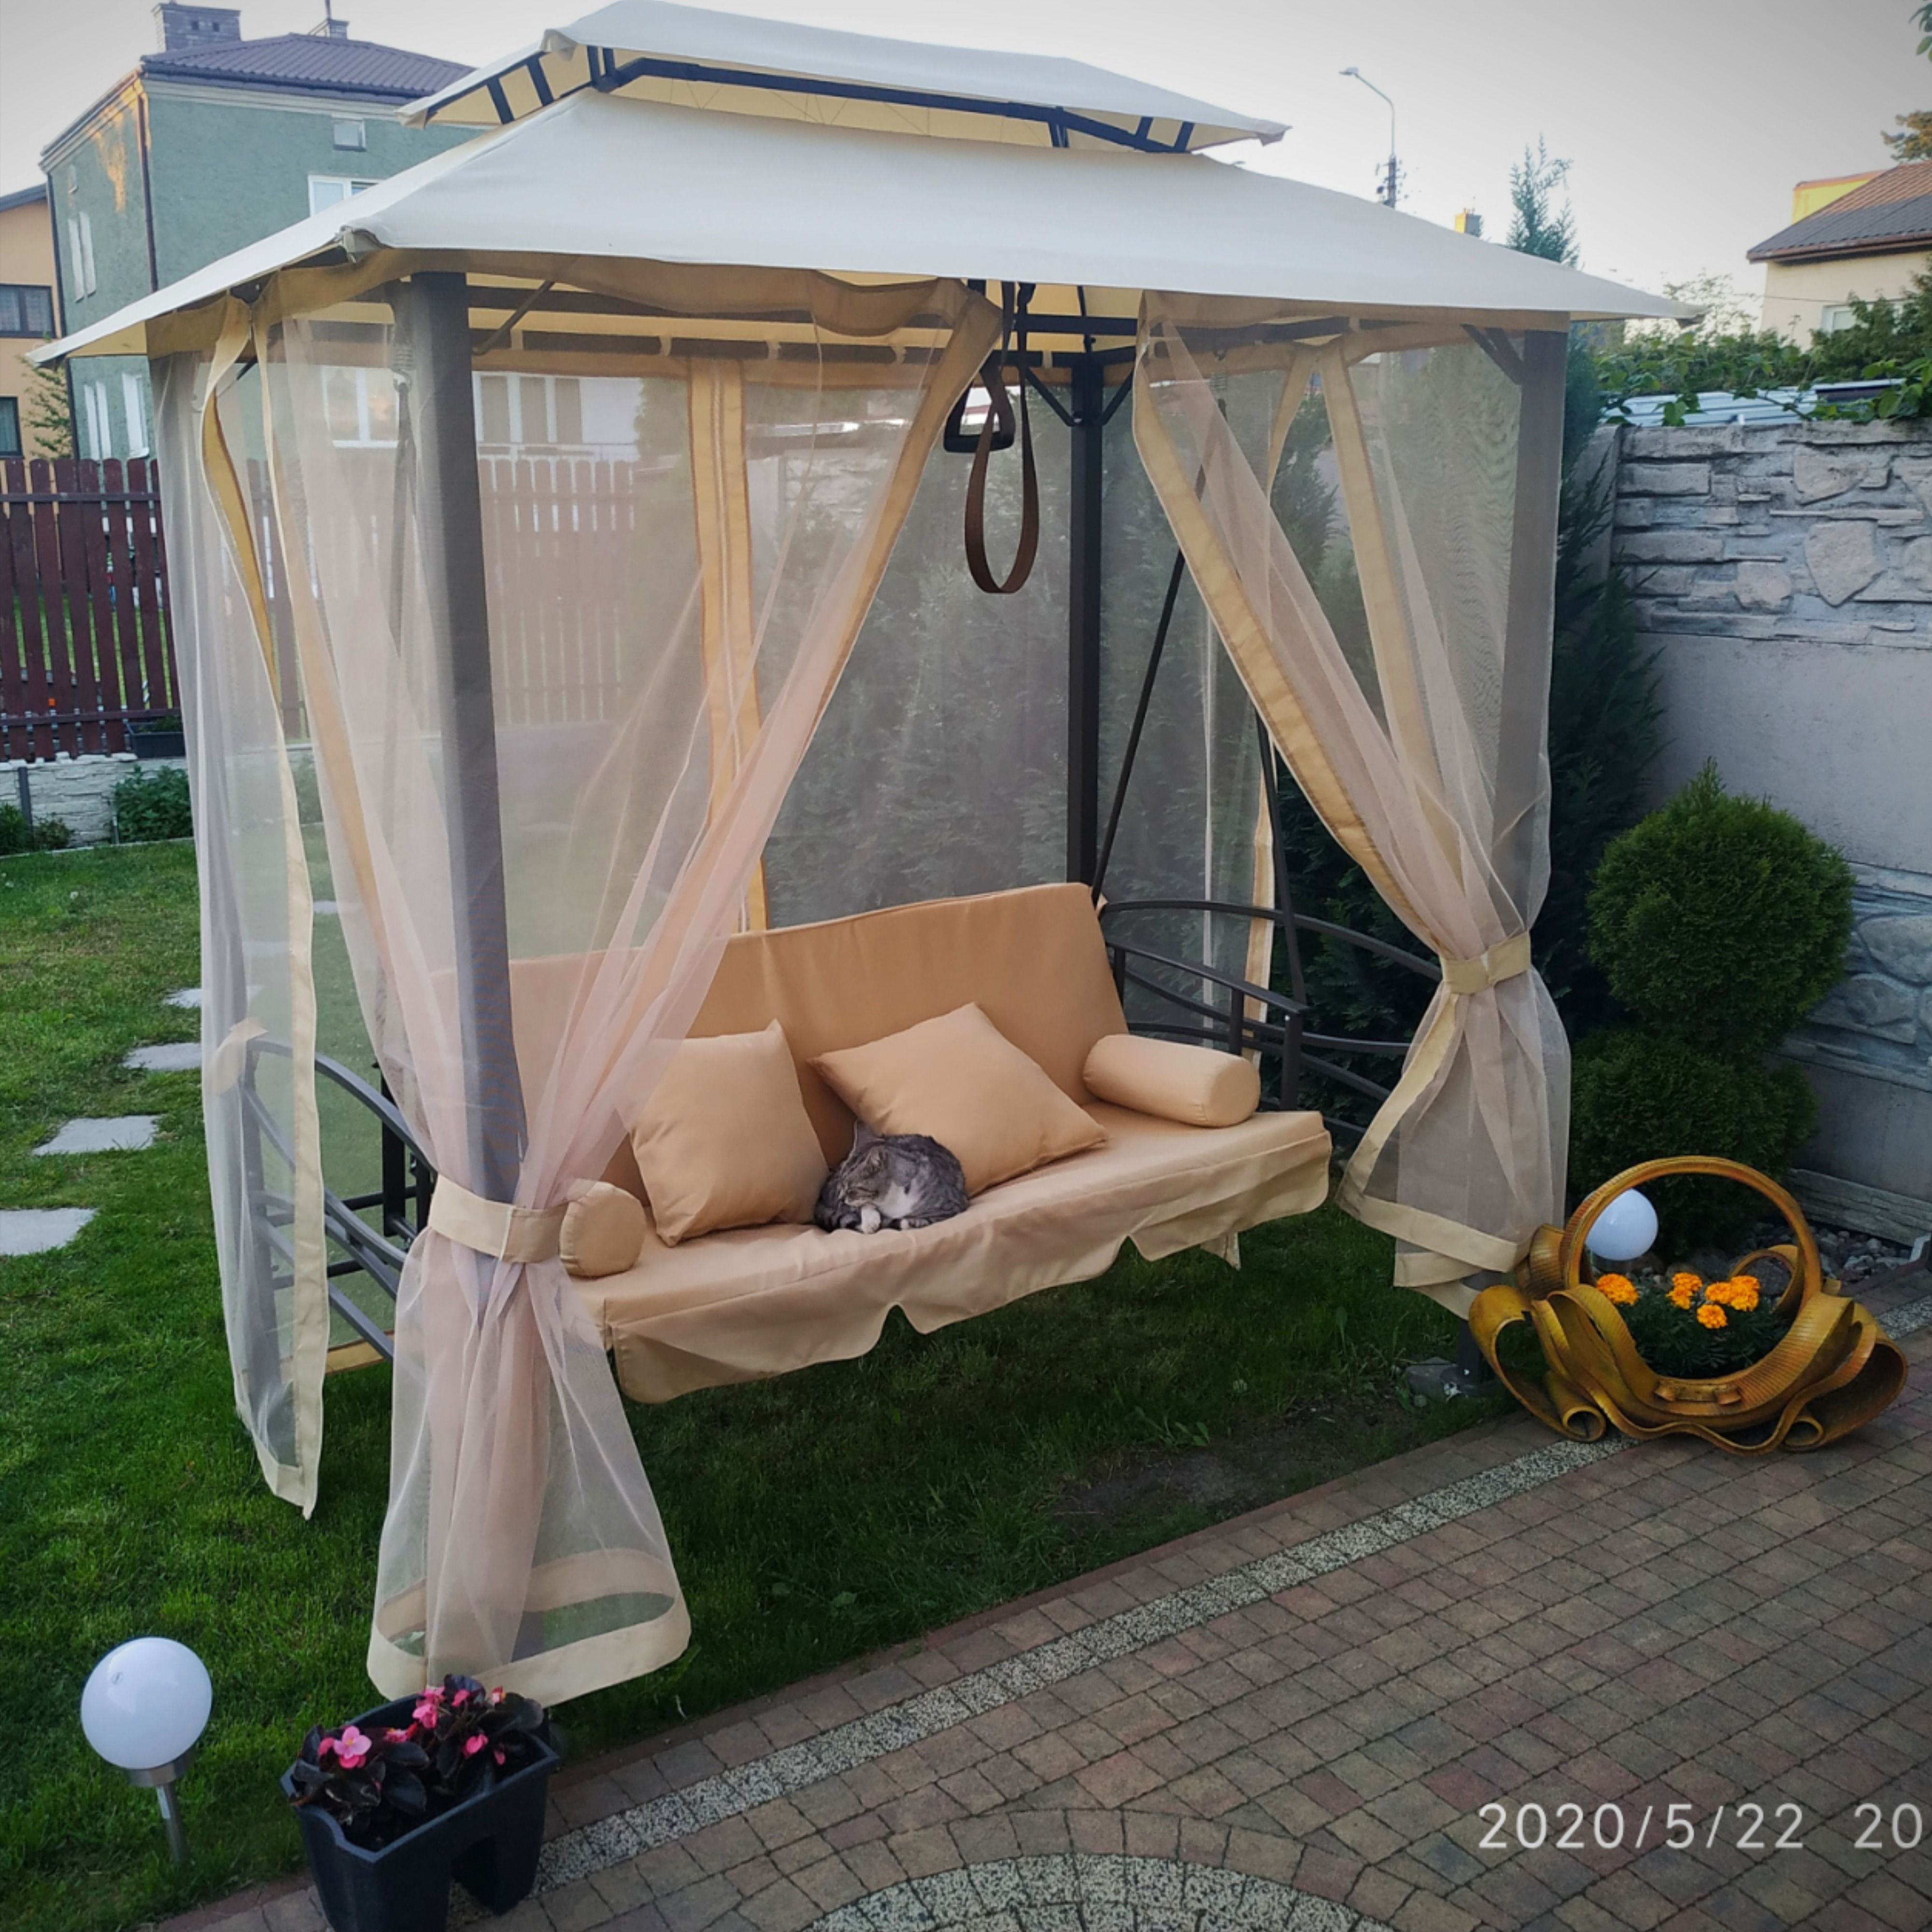 Hustawka Ogrodowa Metalowa Nicea Garden Point Ogrodosfera Pl Furniture Outdoor Furniture Home Decor